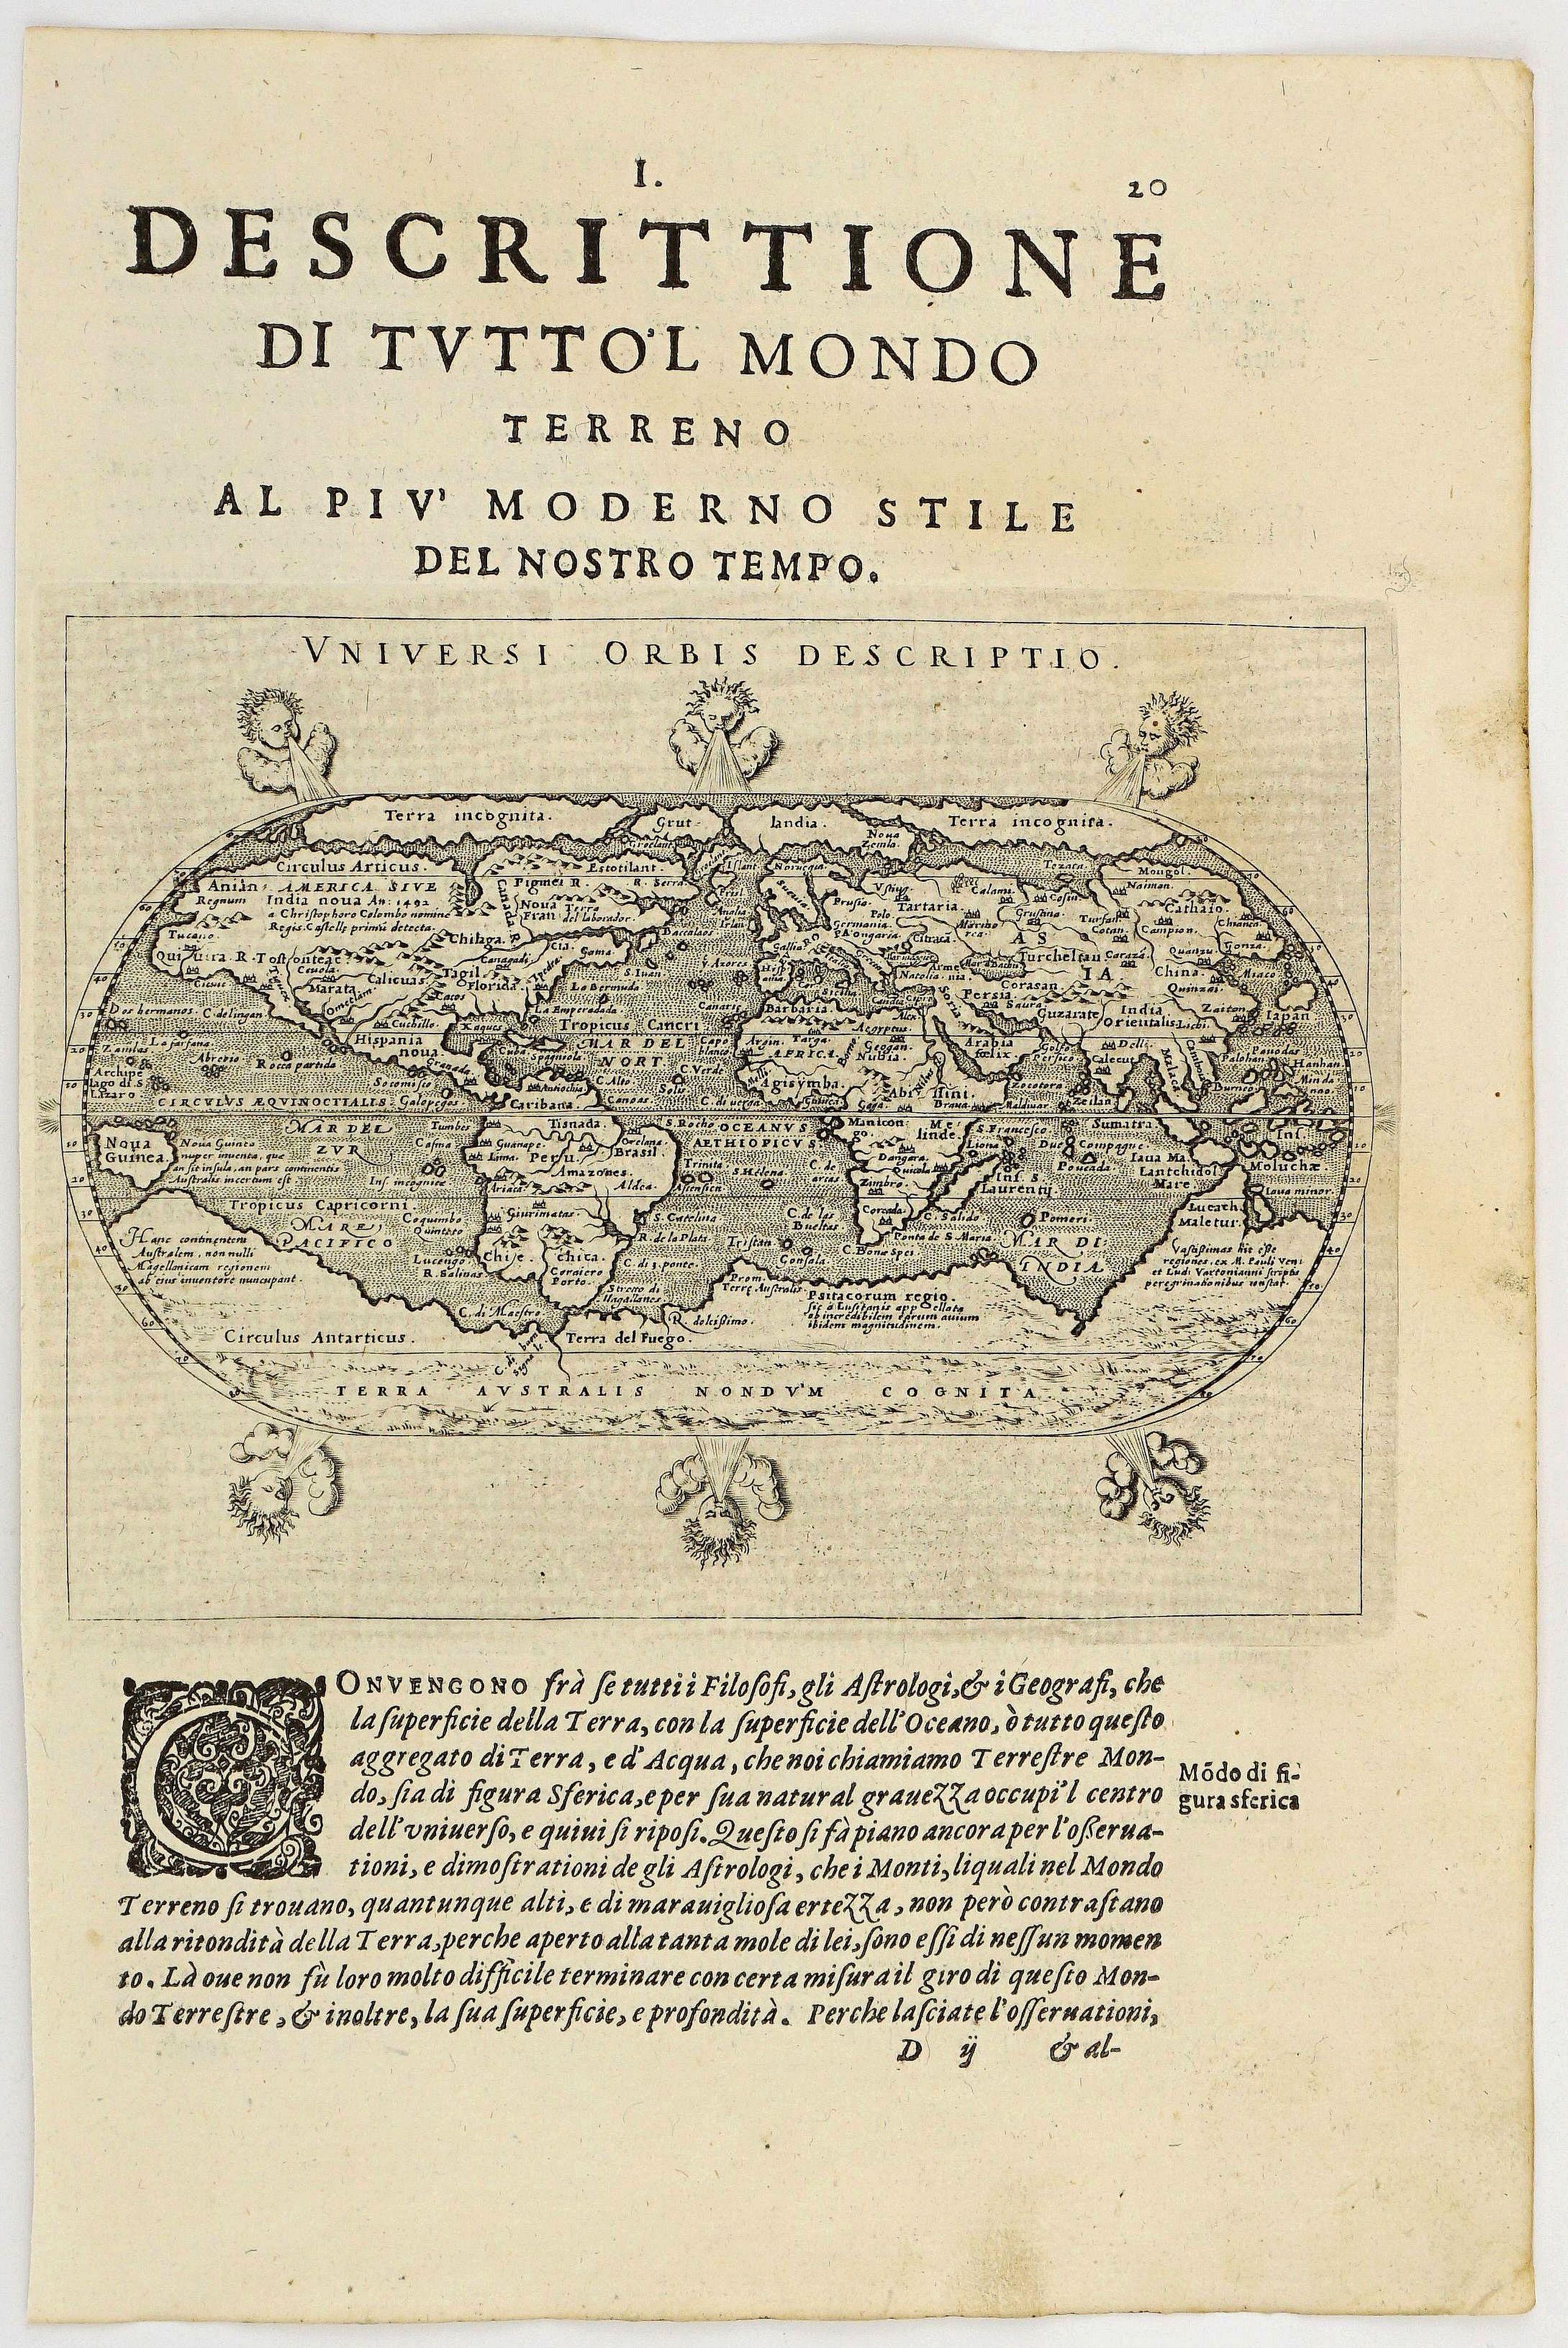 MAGINI, G. A. - Universi Orbis Descriptio.